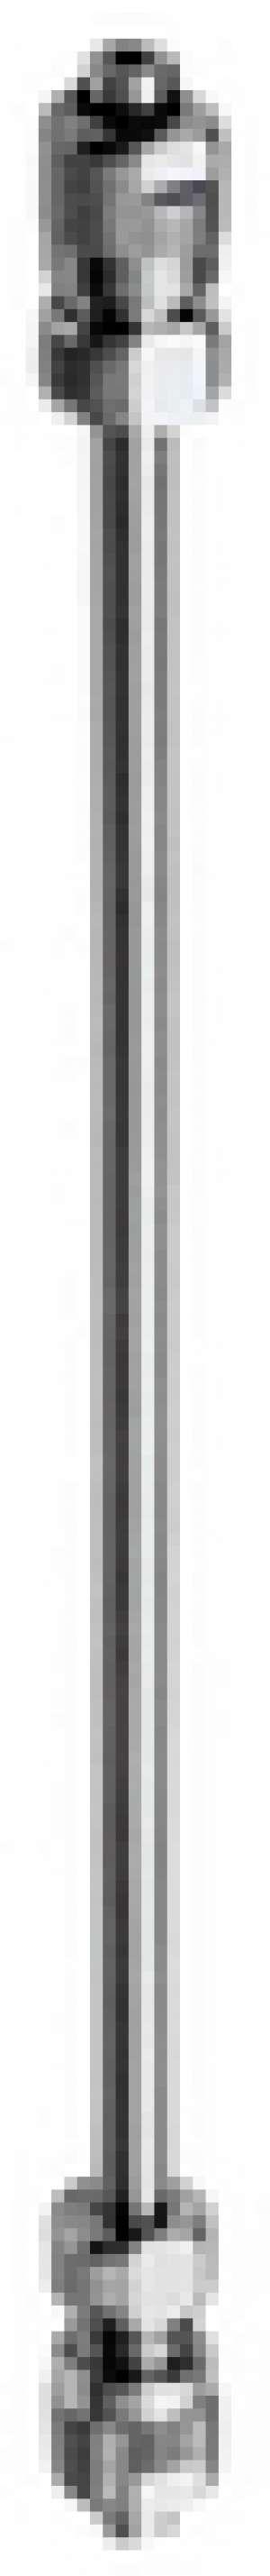 LiChrospher® 60 RP-select B (5 µm) LiChroCART® 250-4 Merck Đức